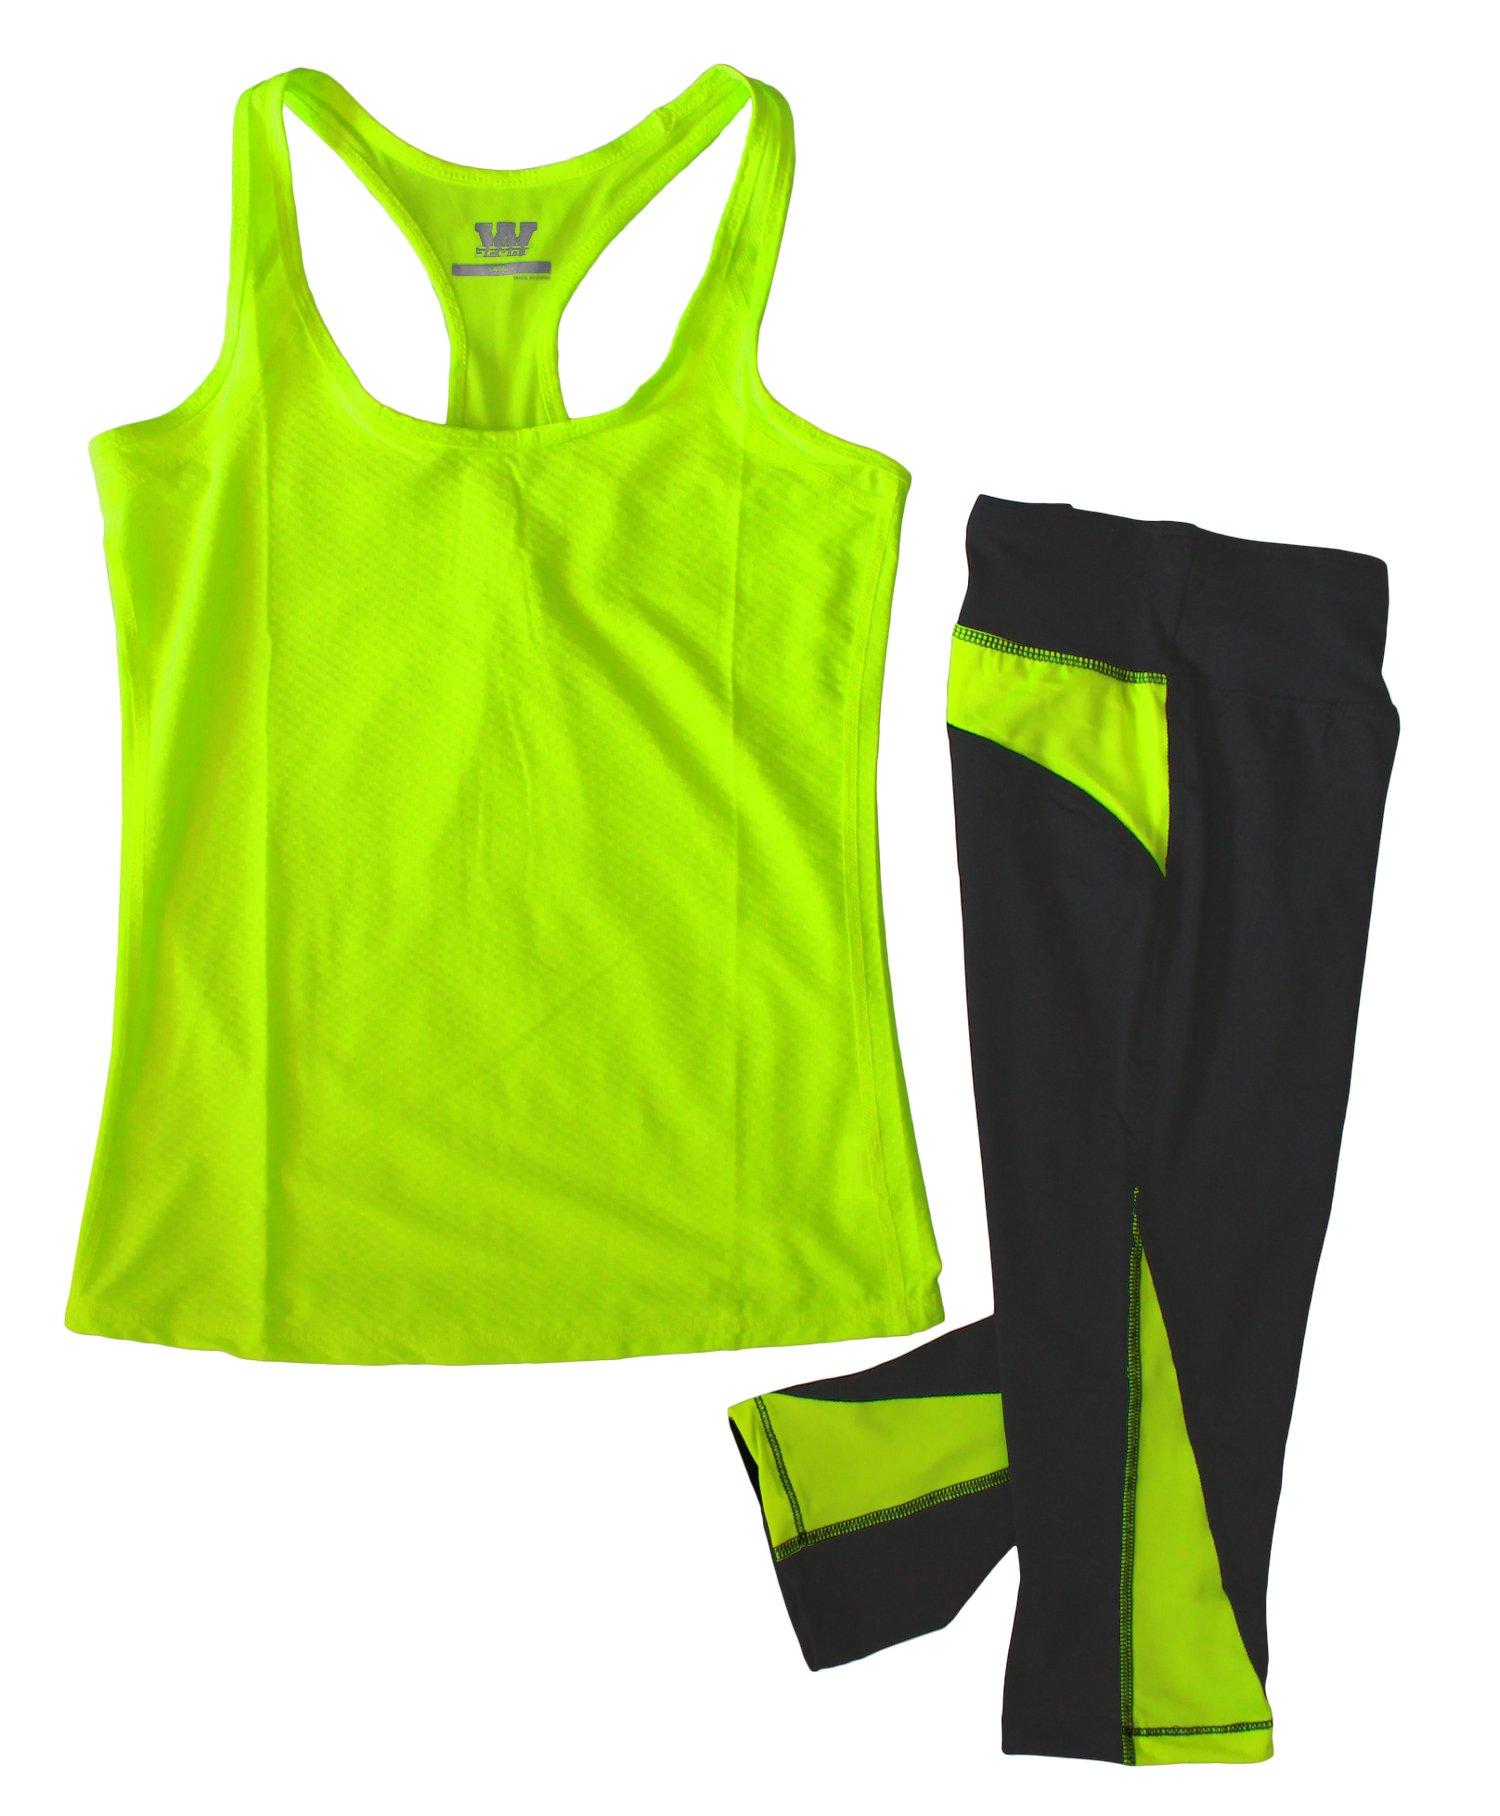 W SPORT Women's Moisture Wick Athletic Yoga Tank Top & Capri Leggings, Neon Yellow, Large